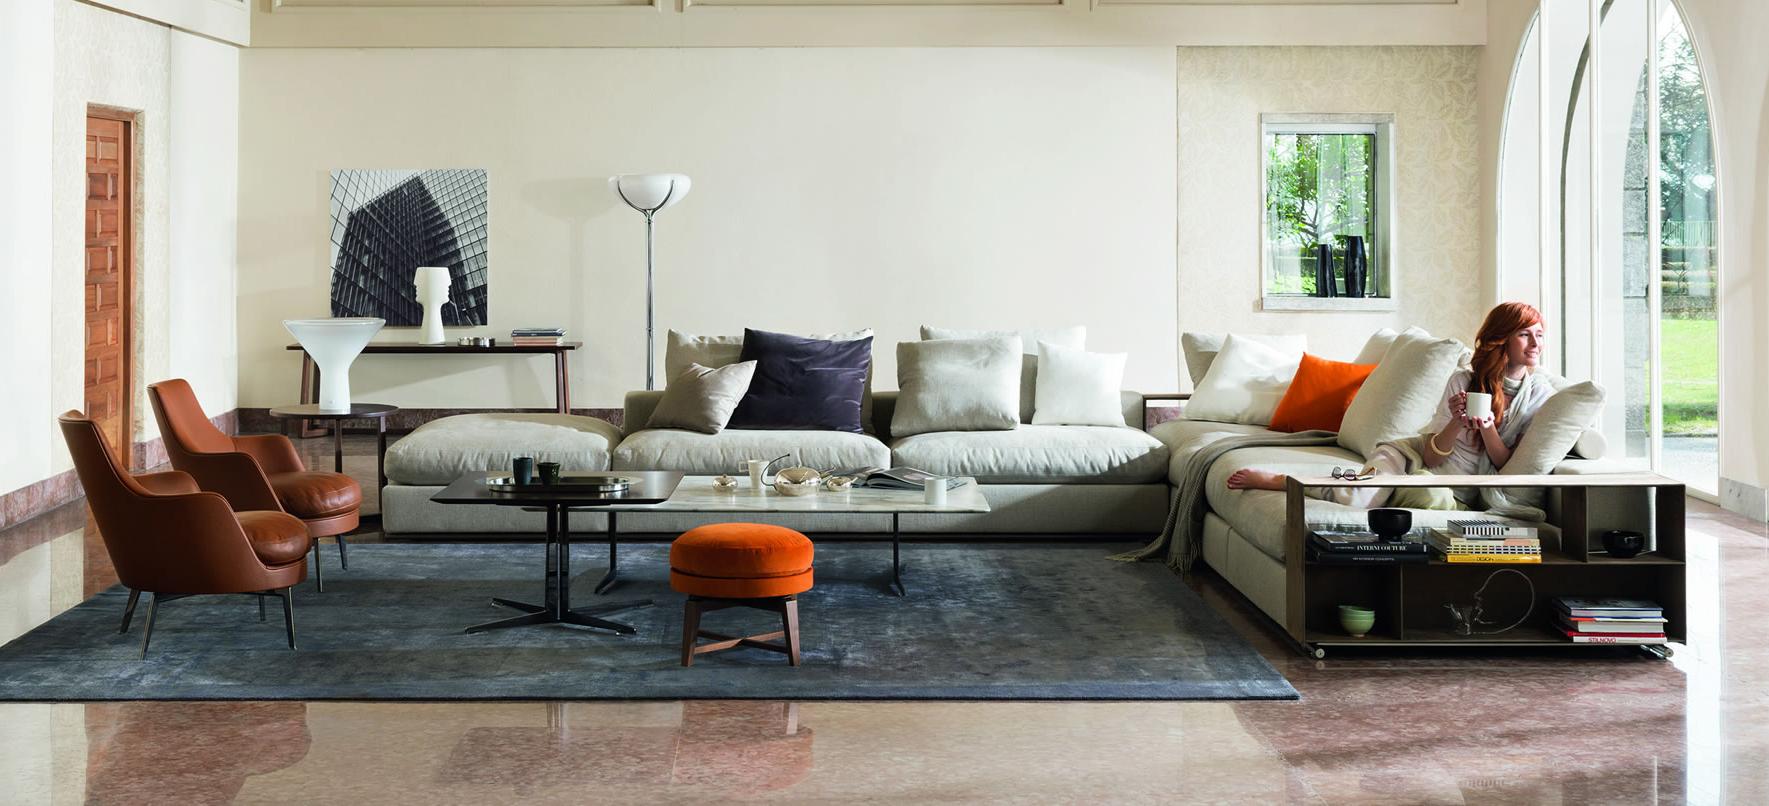 Interior Design Trade Furniture ~ Trade furniture suppliers interior designers